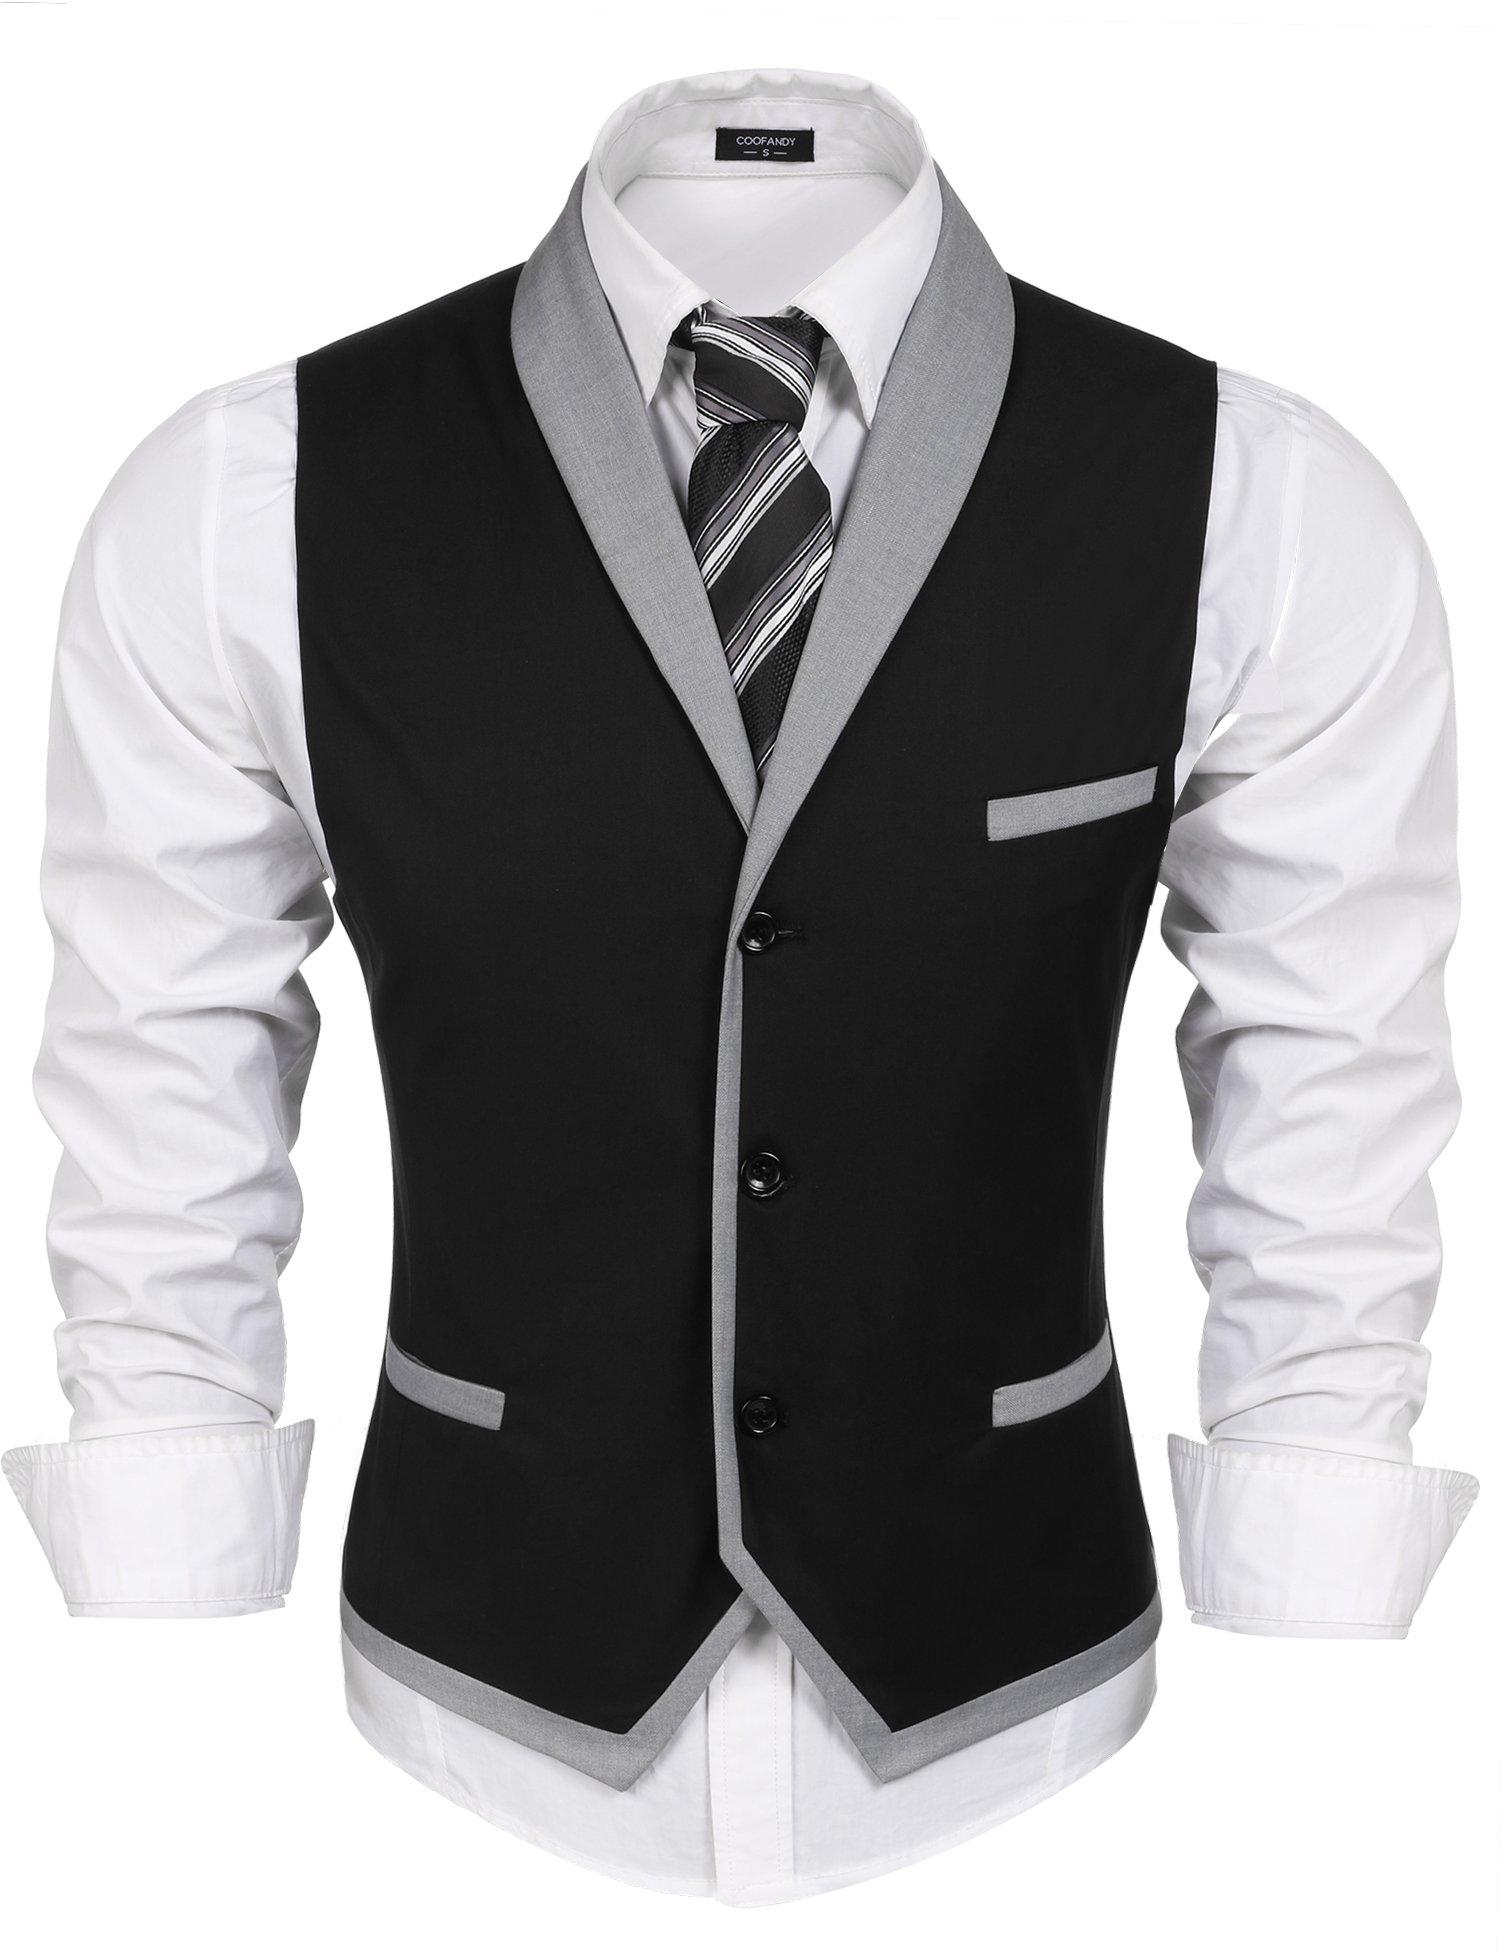 Coofandy Men's V-neck Sleeveless Slim Fit Vest,Jacket Business Suit Dress Vest, Black, Large(Chest  45.3) by COOFANDY